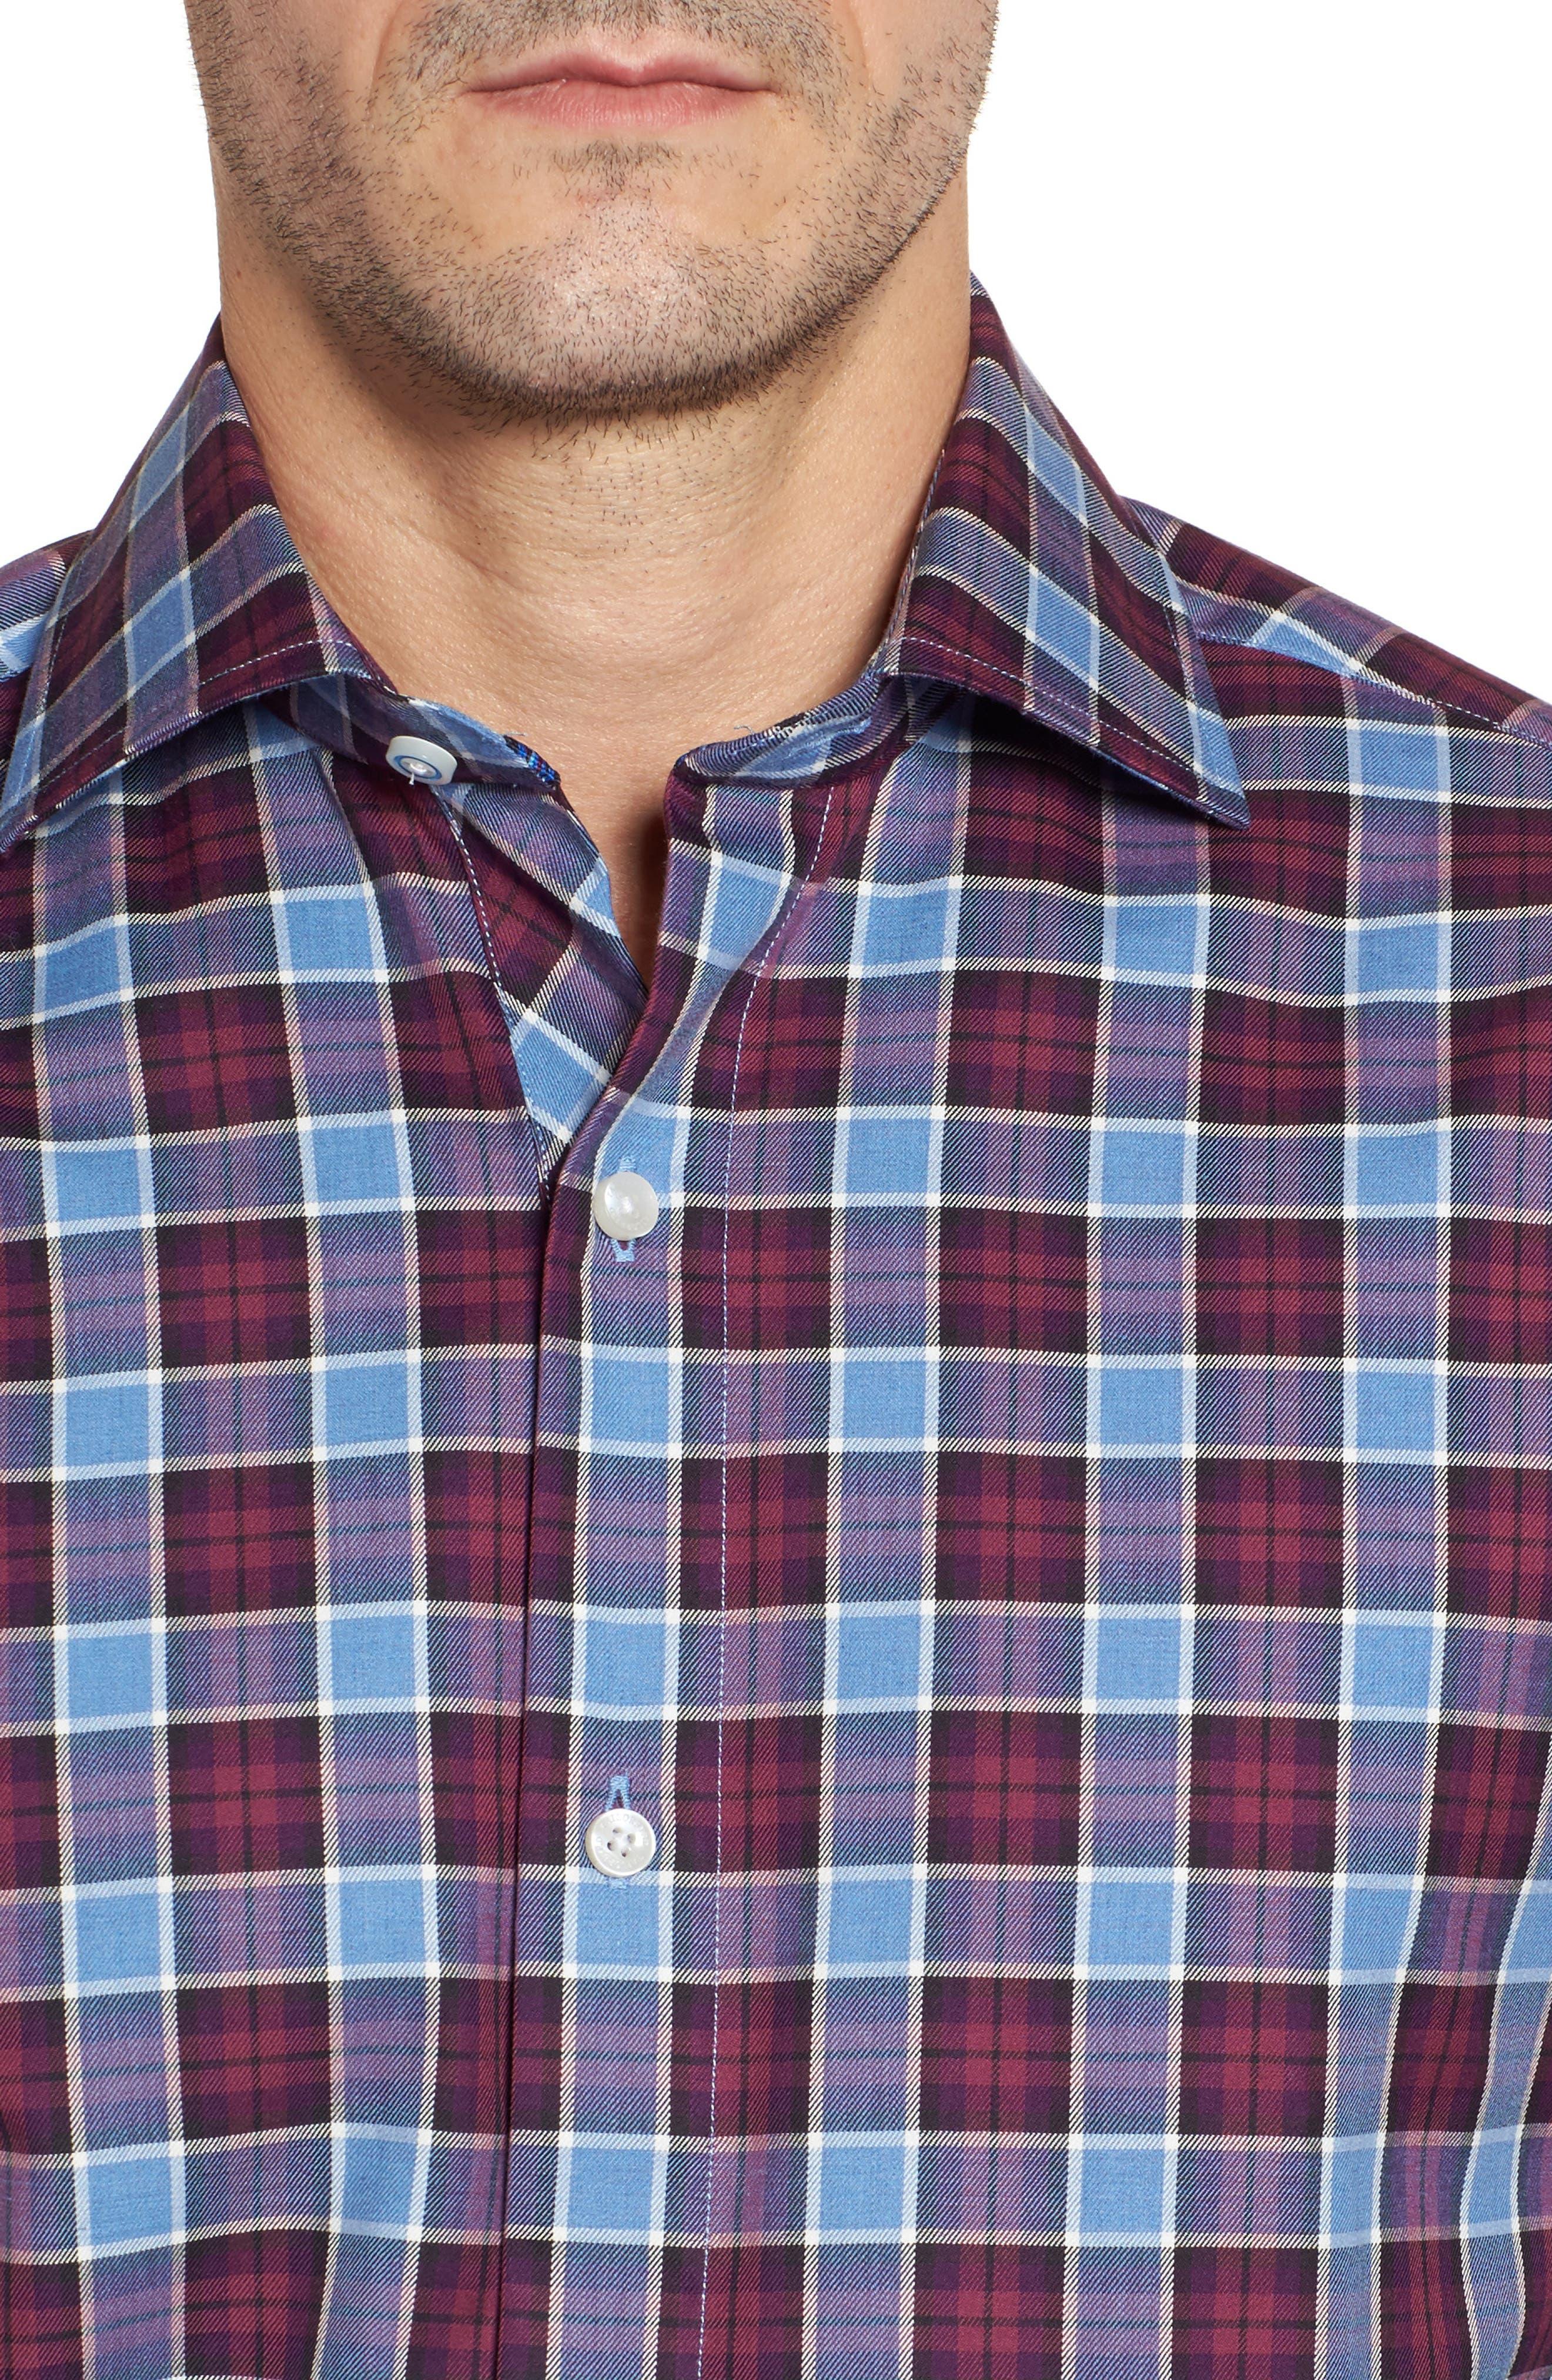 Alternate Image 4  - TailorByrd Campti Regular Fit Plaid Sport Shirt